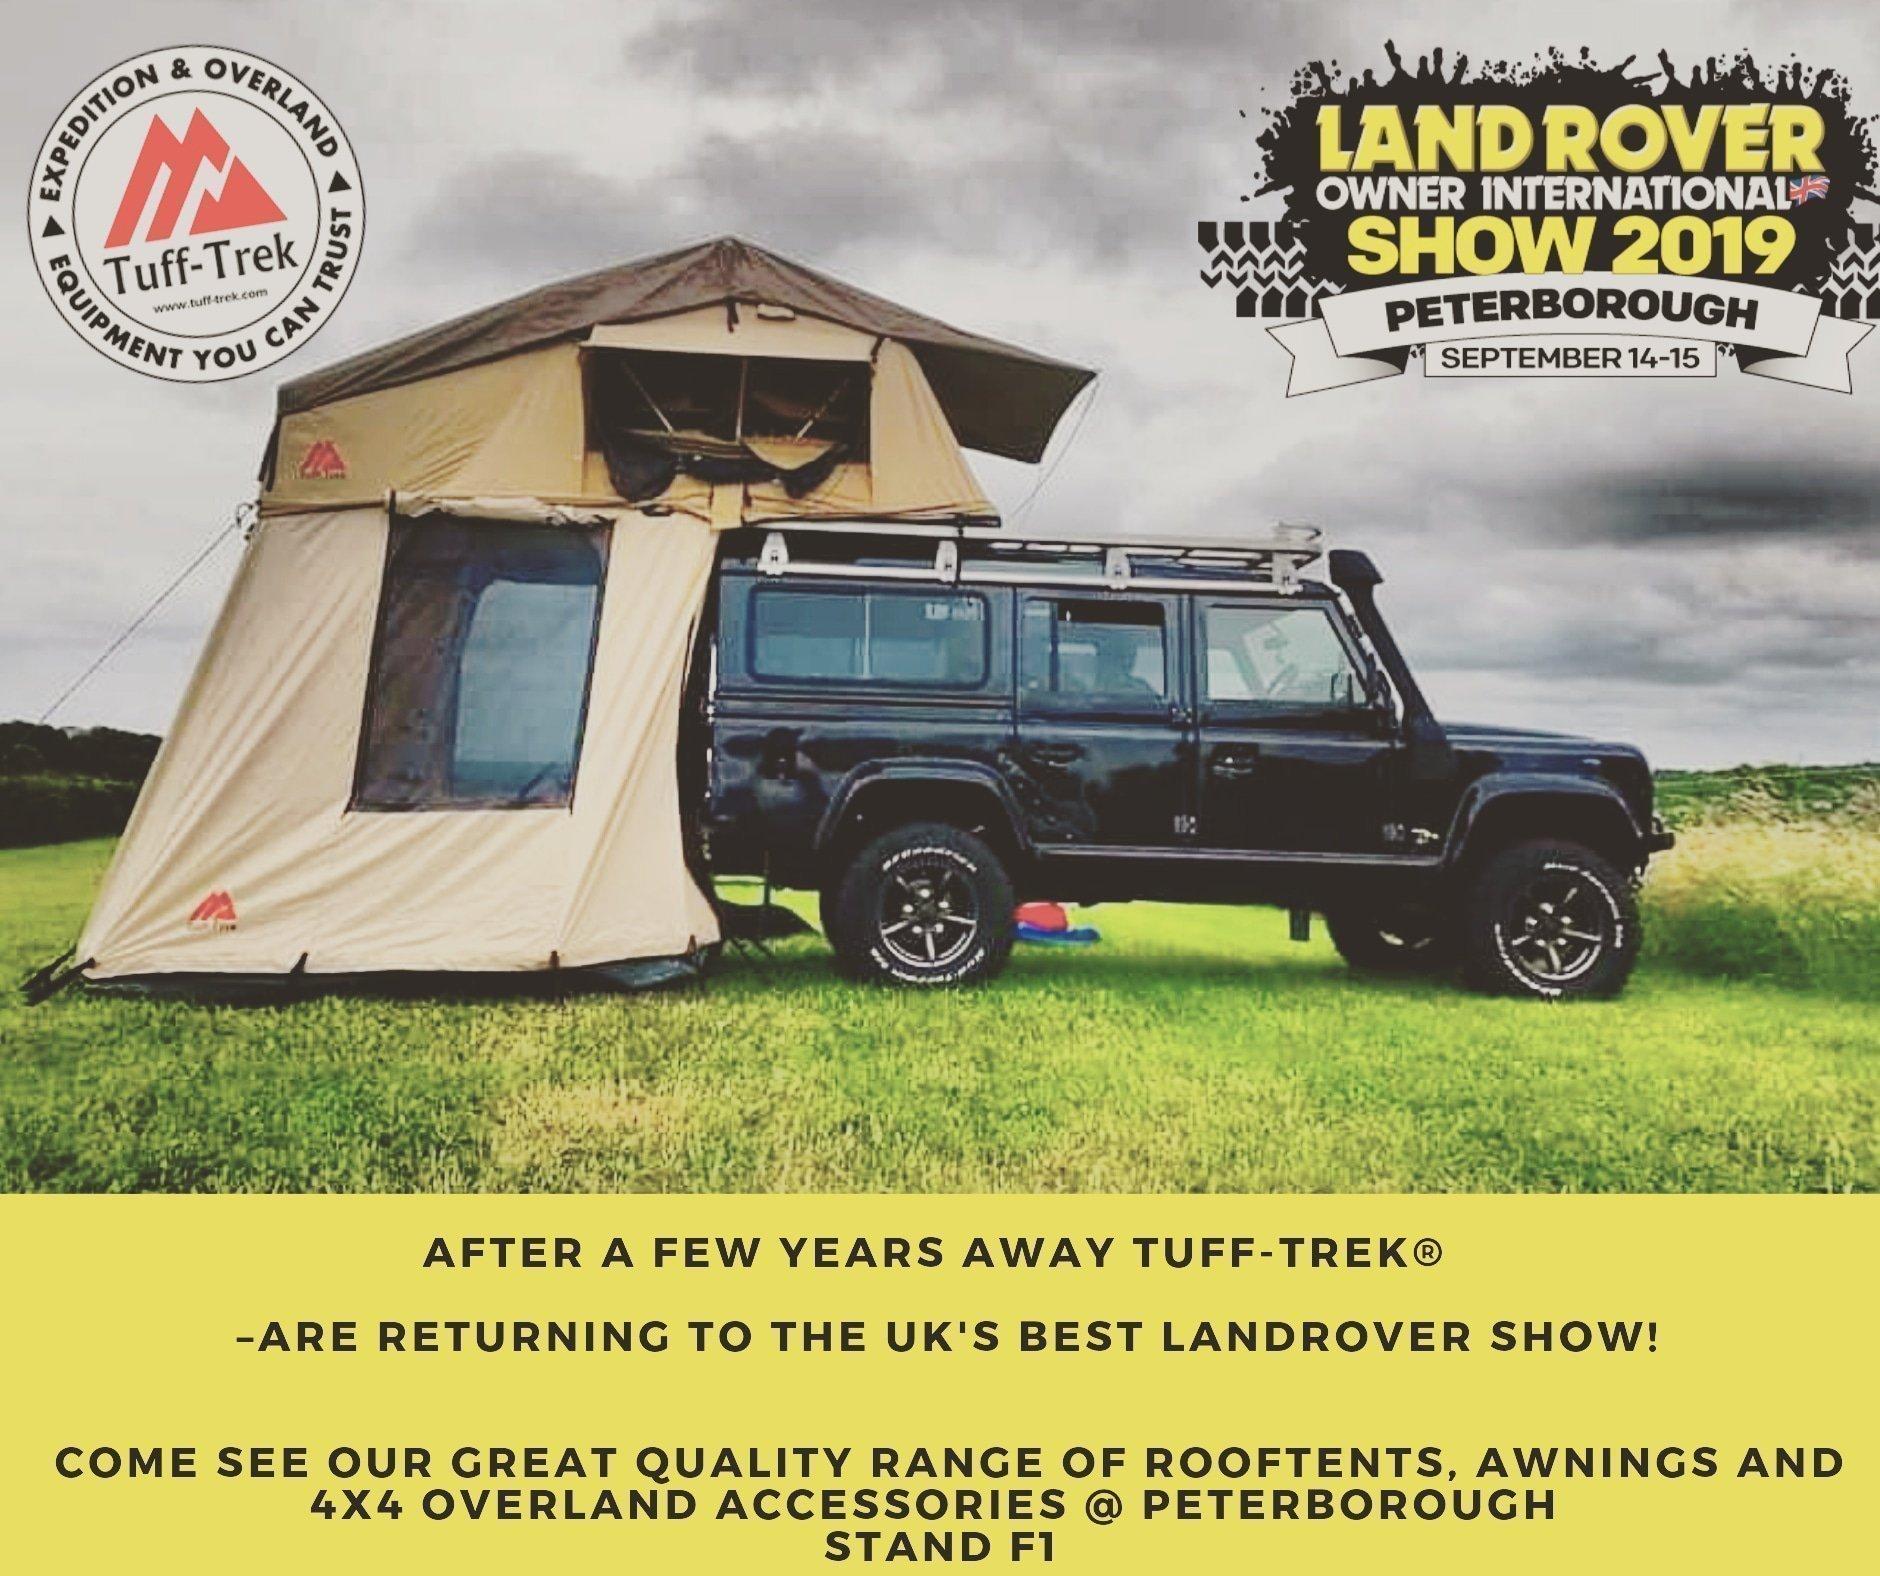 Peterborough Land Rover Owners Show 2019 Tuff Trek